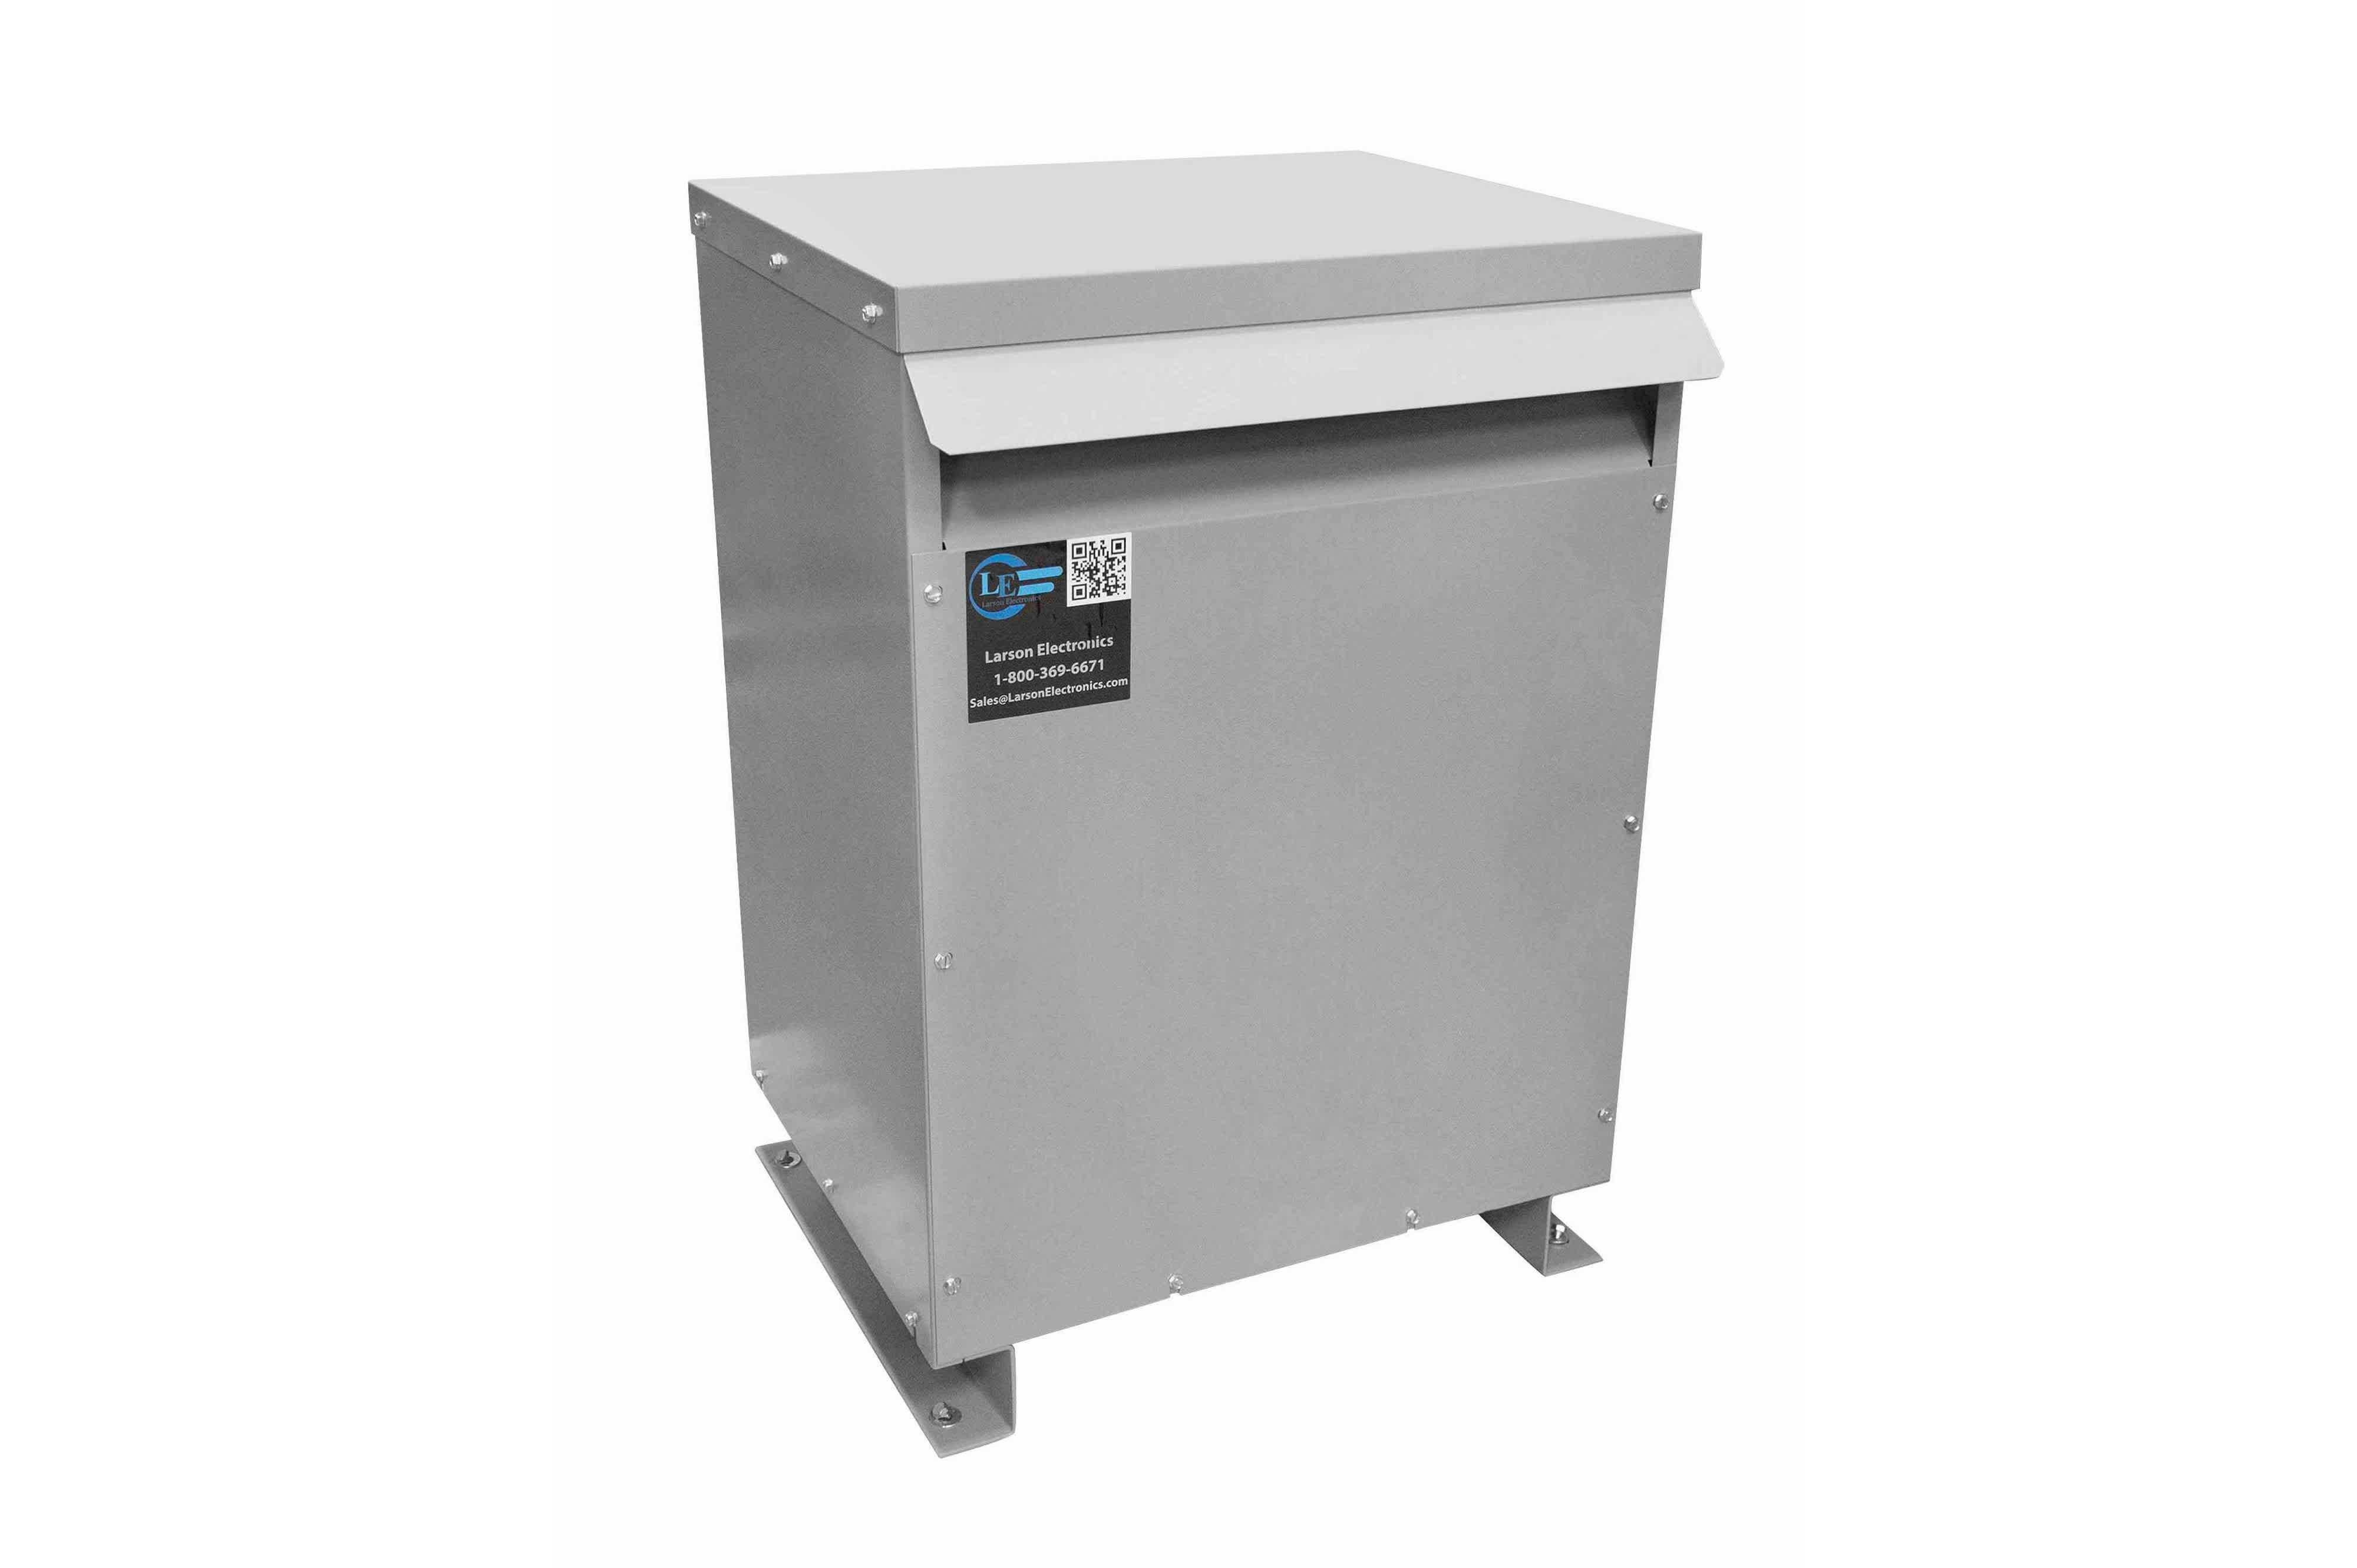 32.5 kVA 3PH Isolation Transformer, 575V Wye Primary, 415Y/240 Wye-N Secondary, N3R, Ventilated, 60 Hz